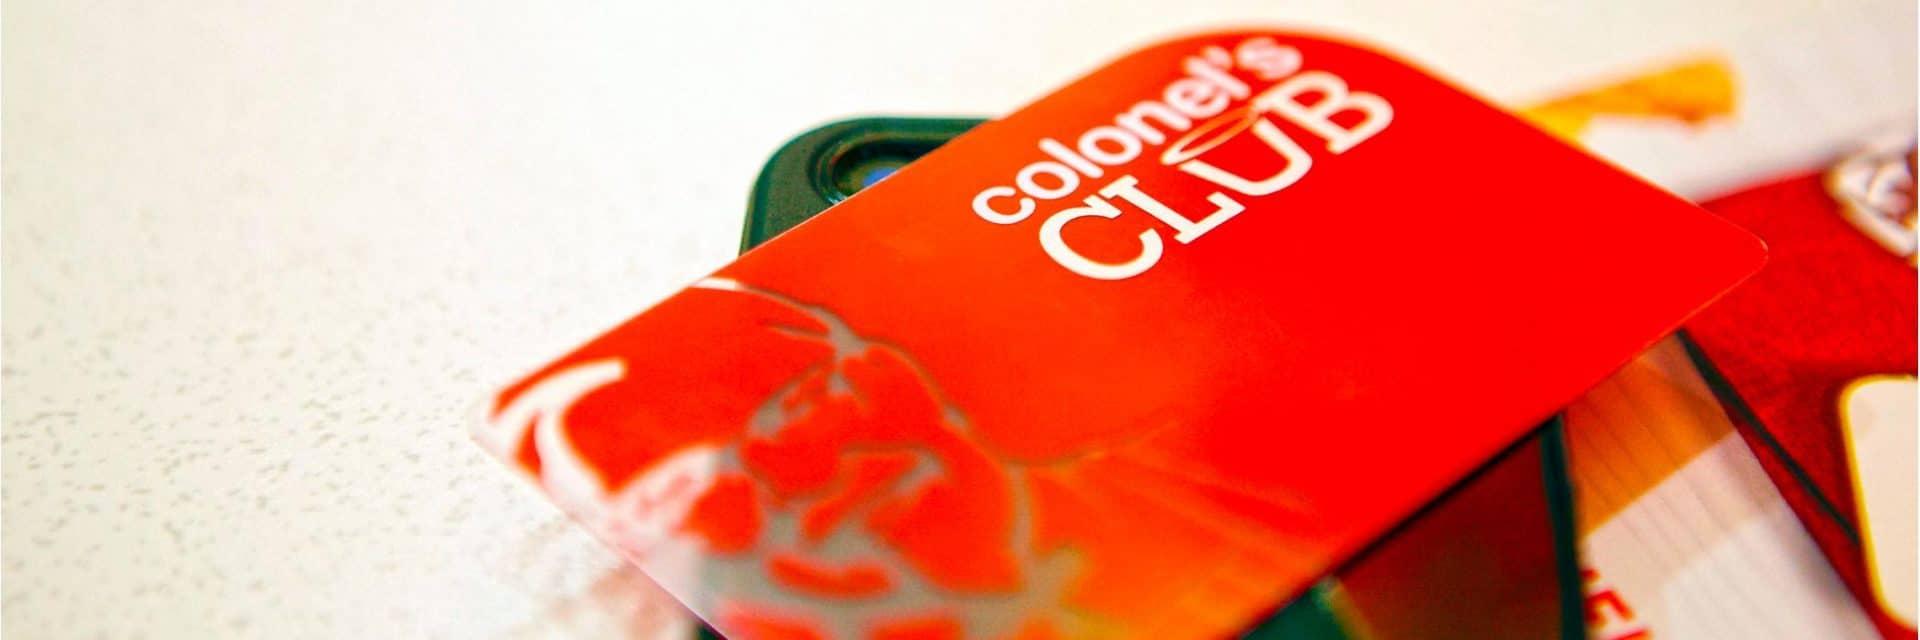 Plastic loyalty cards